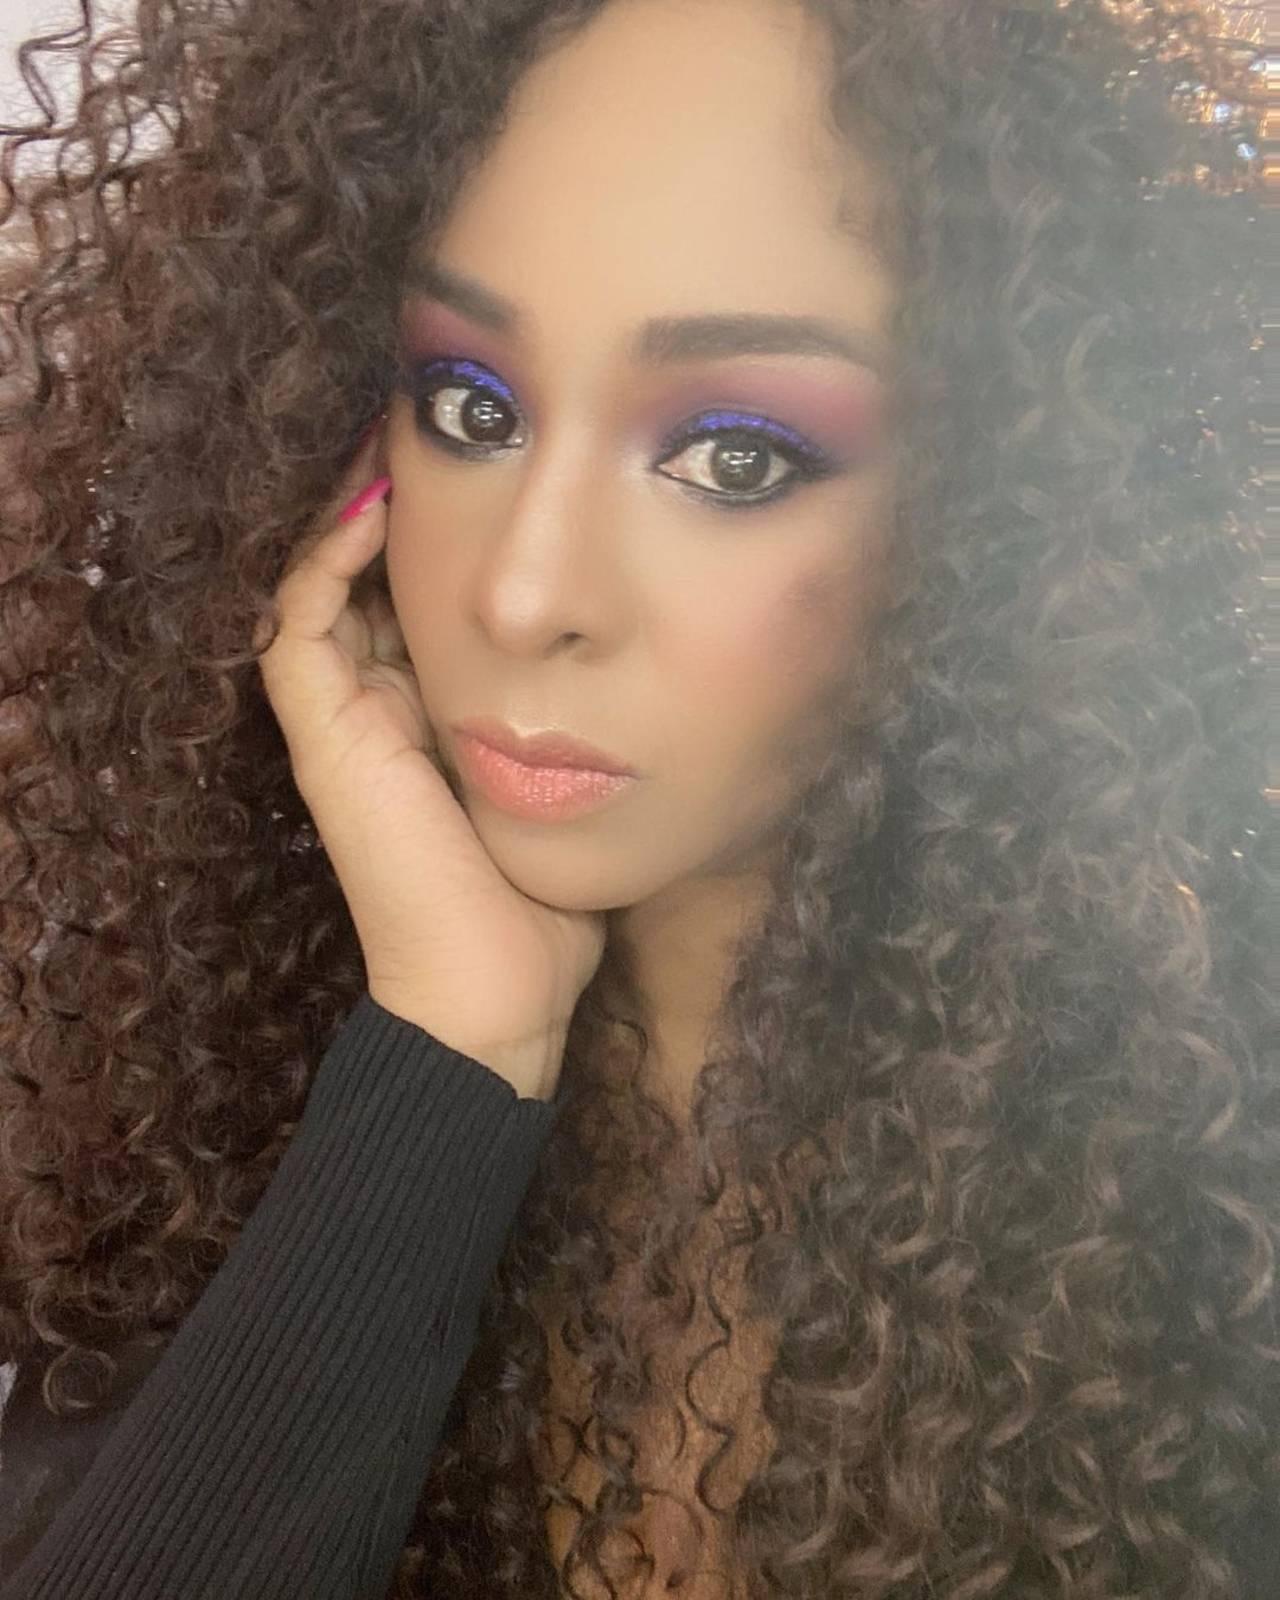 Lidia Ávila no soporta que M'Balia sea lesbiana